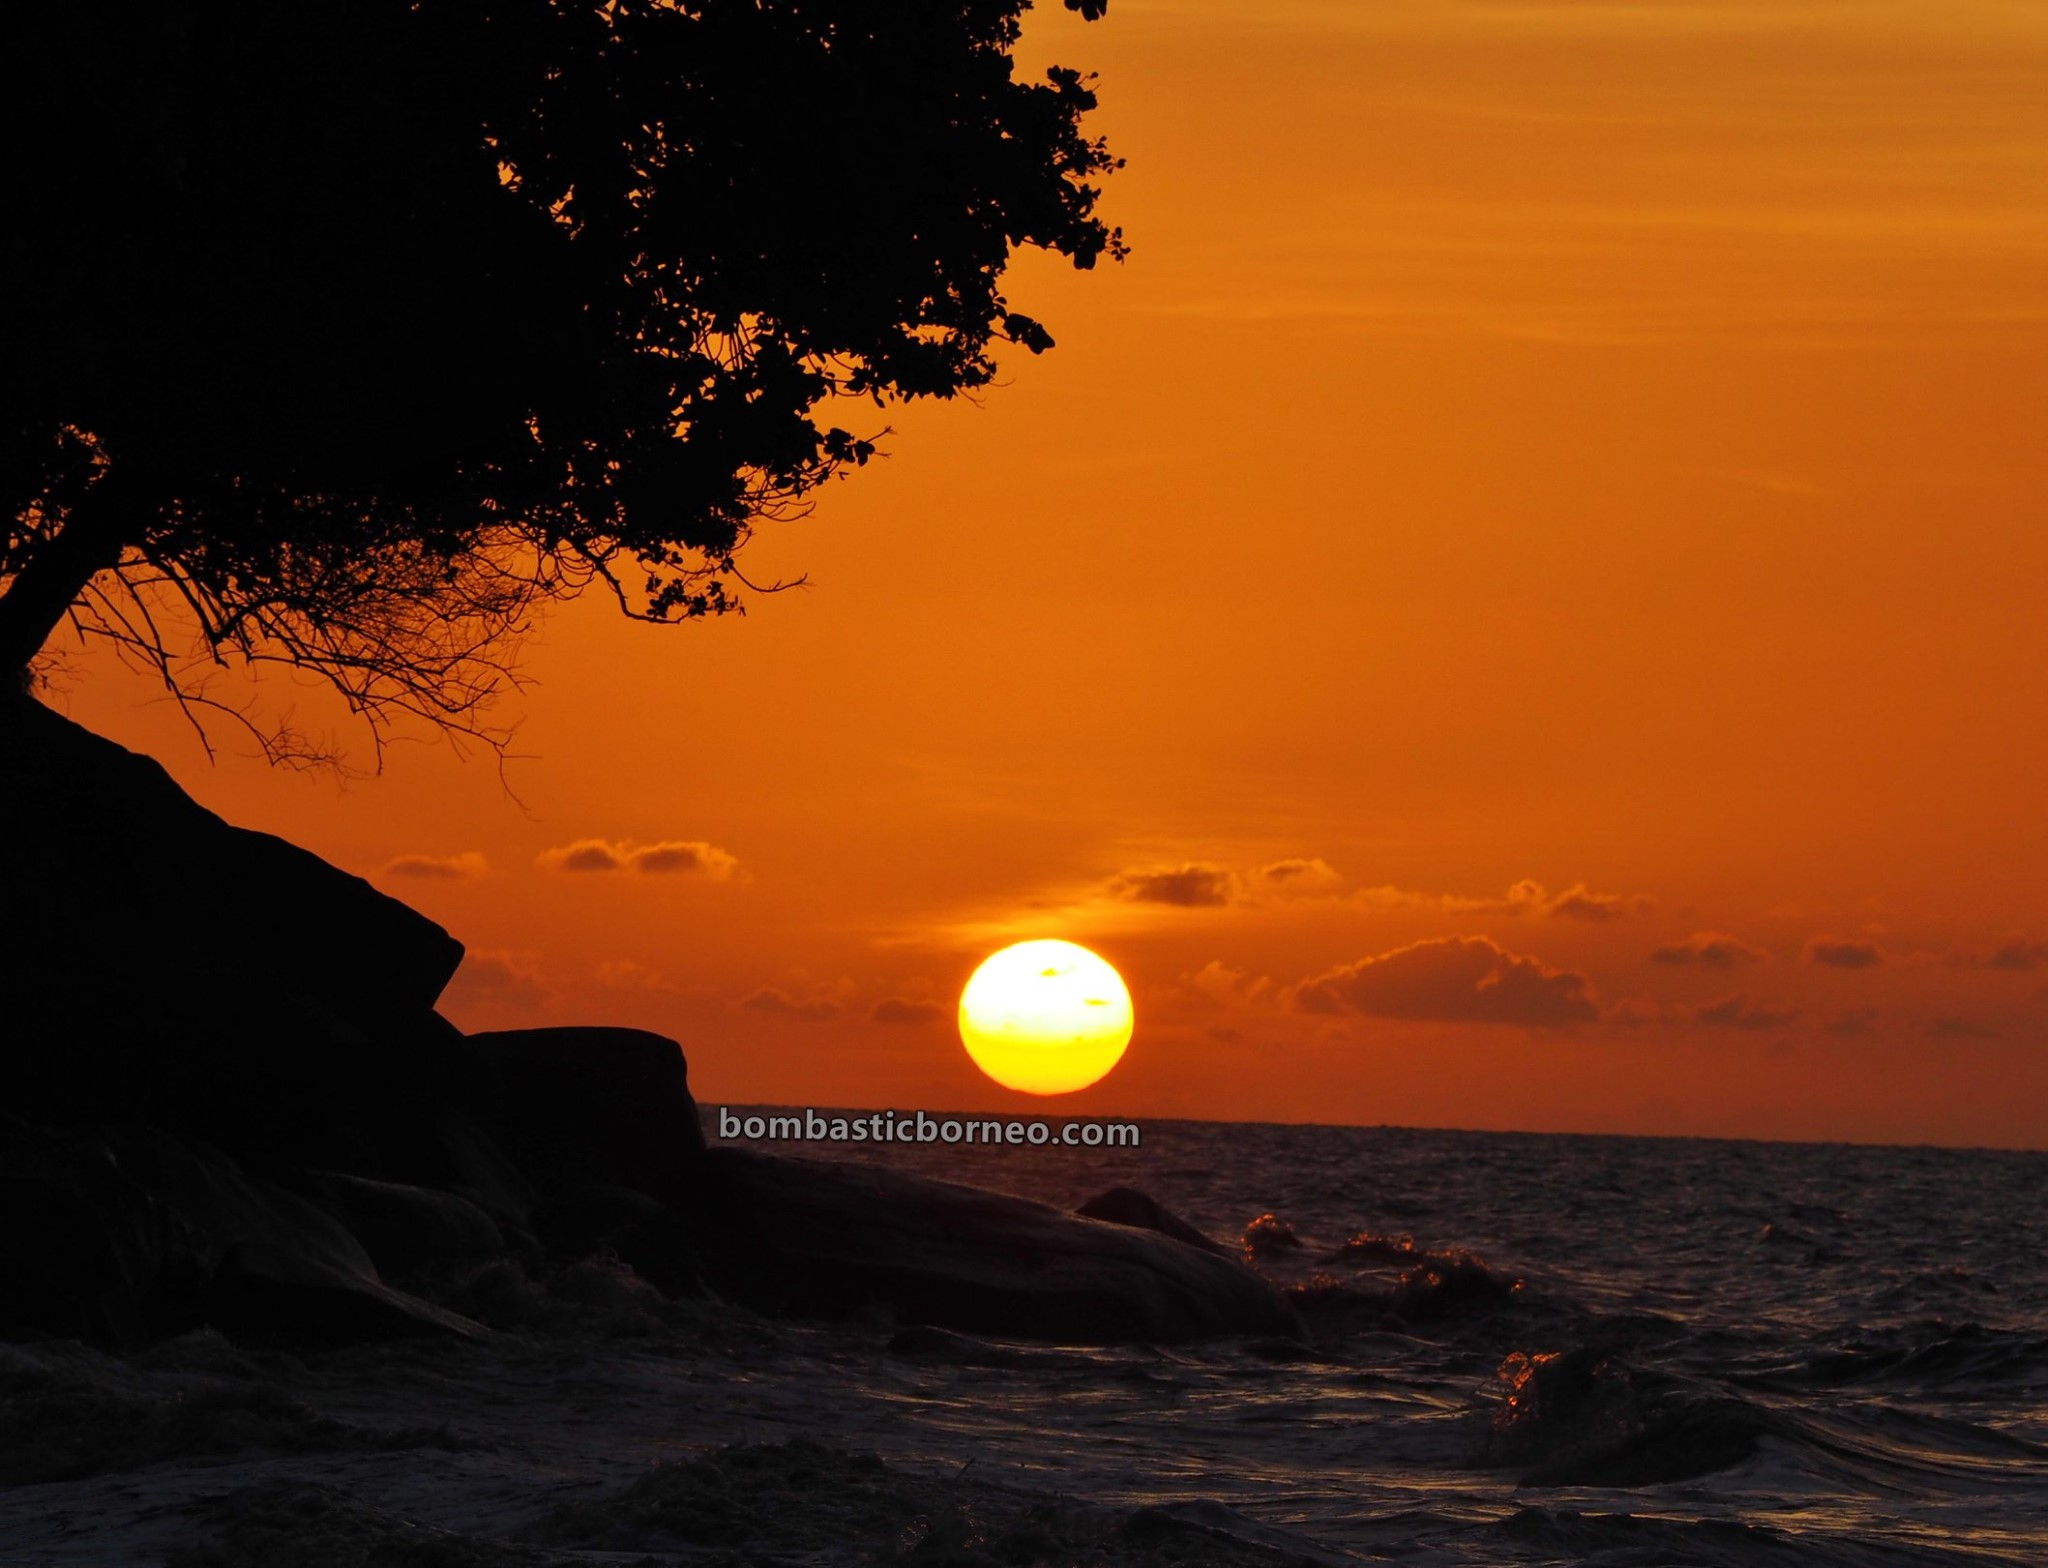 Pantai Putri Serayi, beach, adventure, nature, Malay fishing village, Kampung Nelayan Melayu, Indonesia, Jawai Laut, wisata alam, Tourism, tourist attraction, backpackers, 跨境婆罗洲游踪, 印尼西加里曼丹, 三发马来渔村